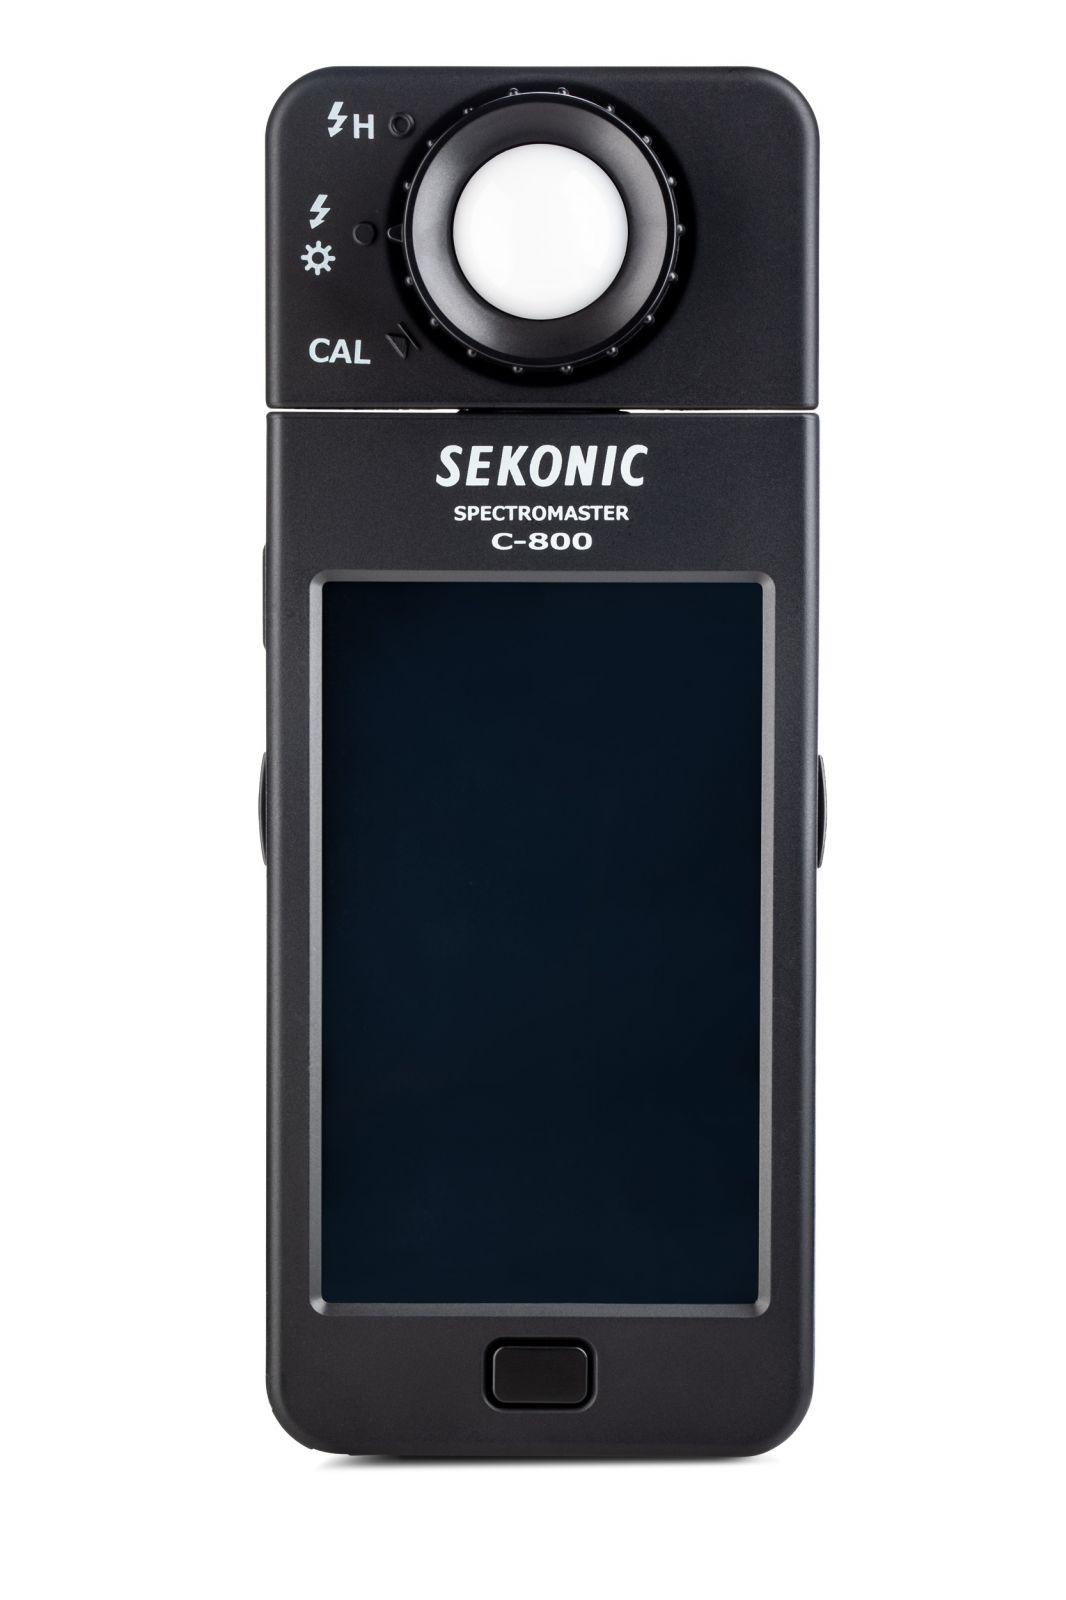 Expozimetr Sekonic C-800 Spectromaster